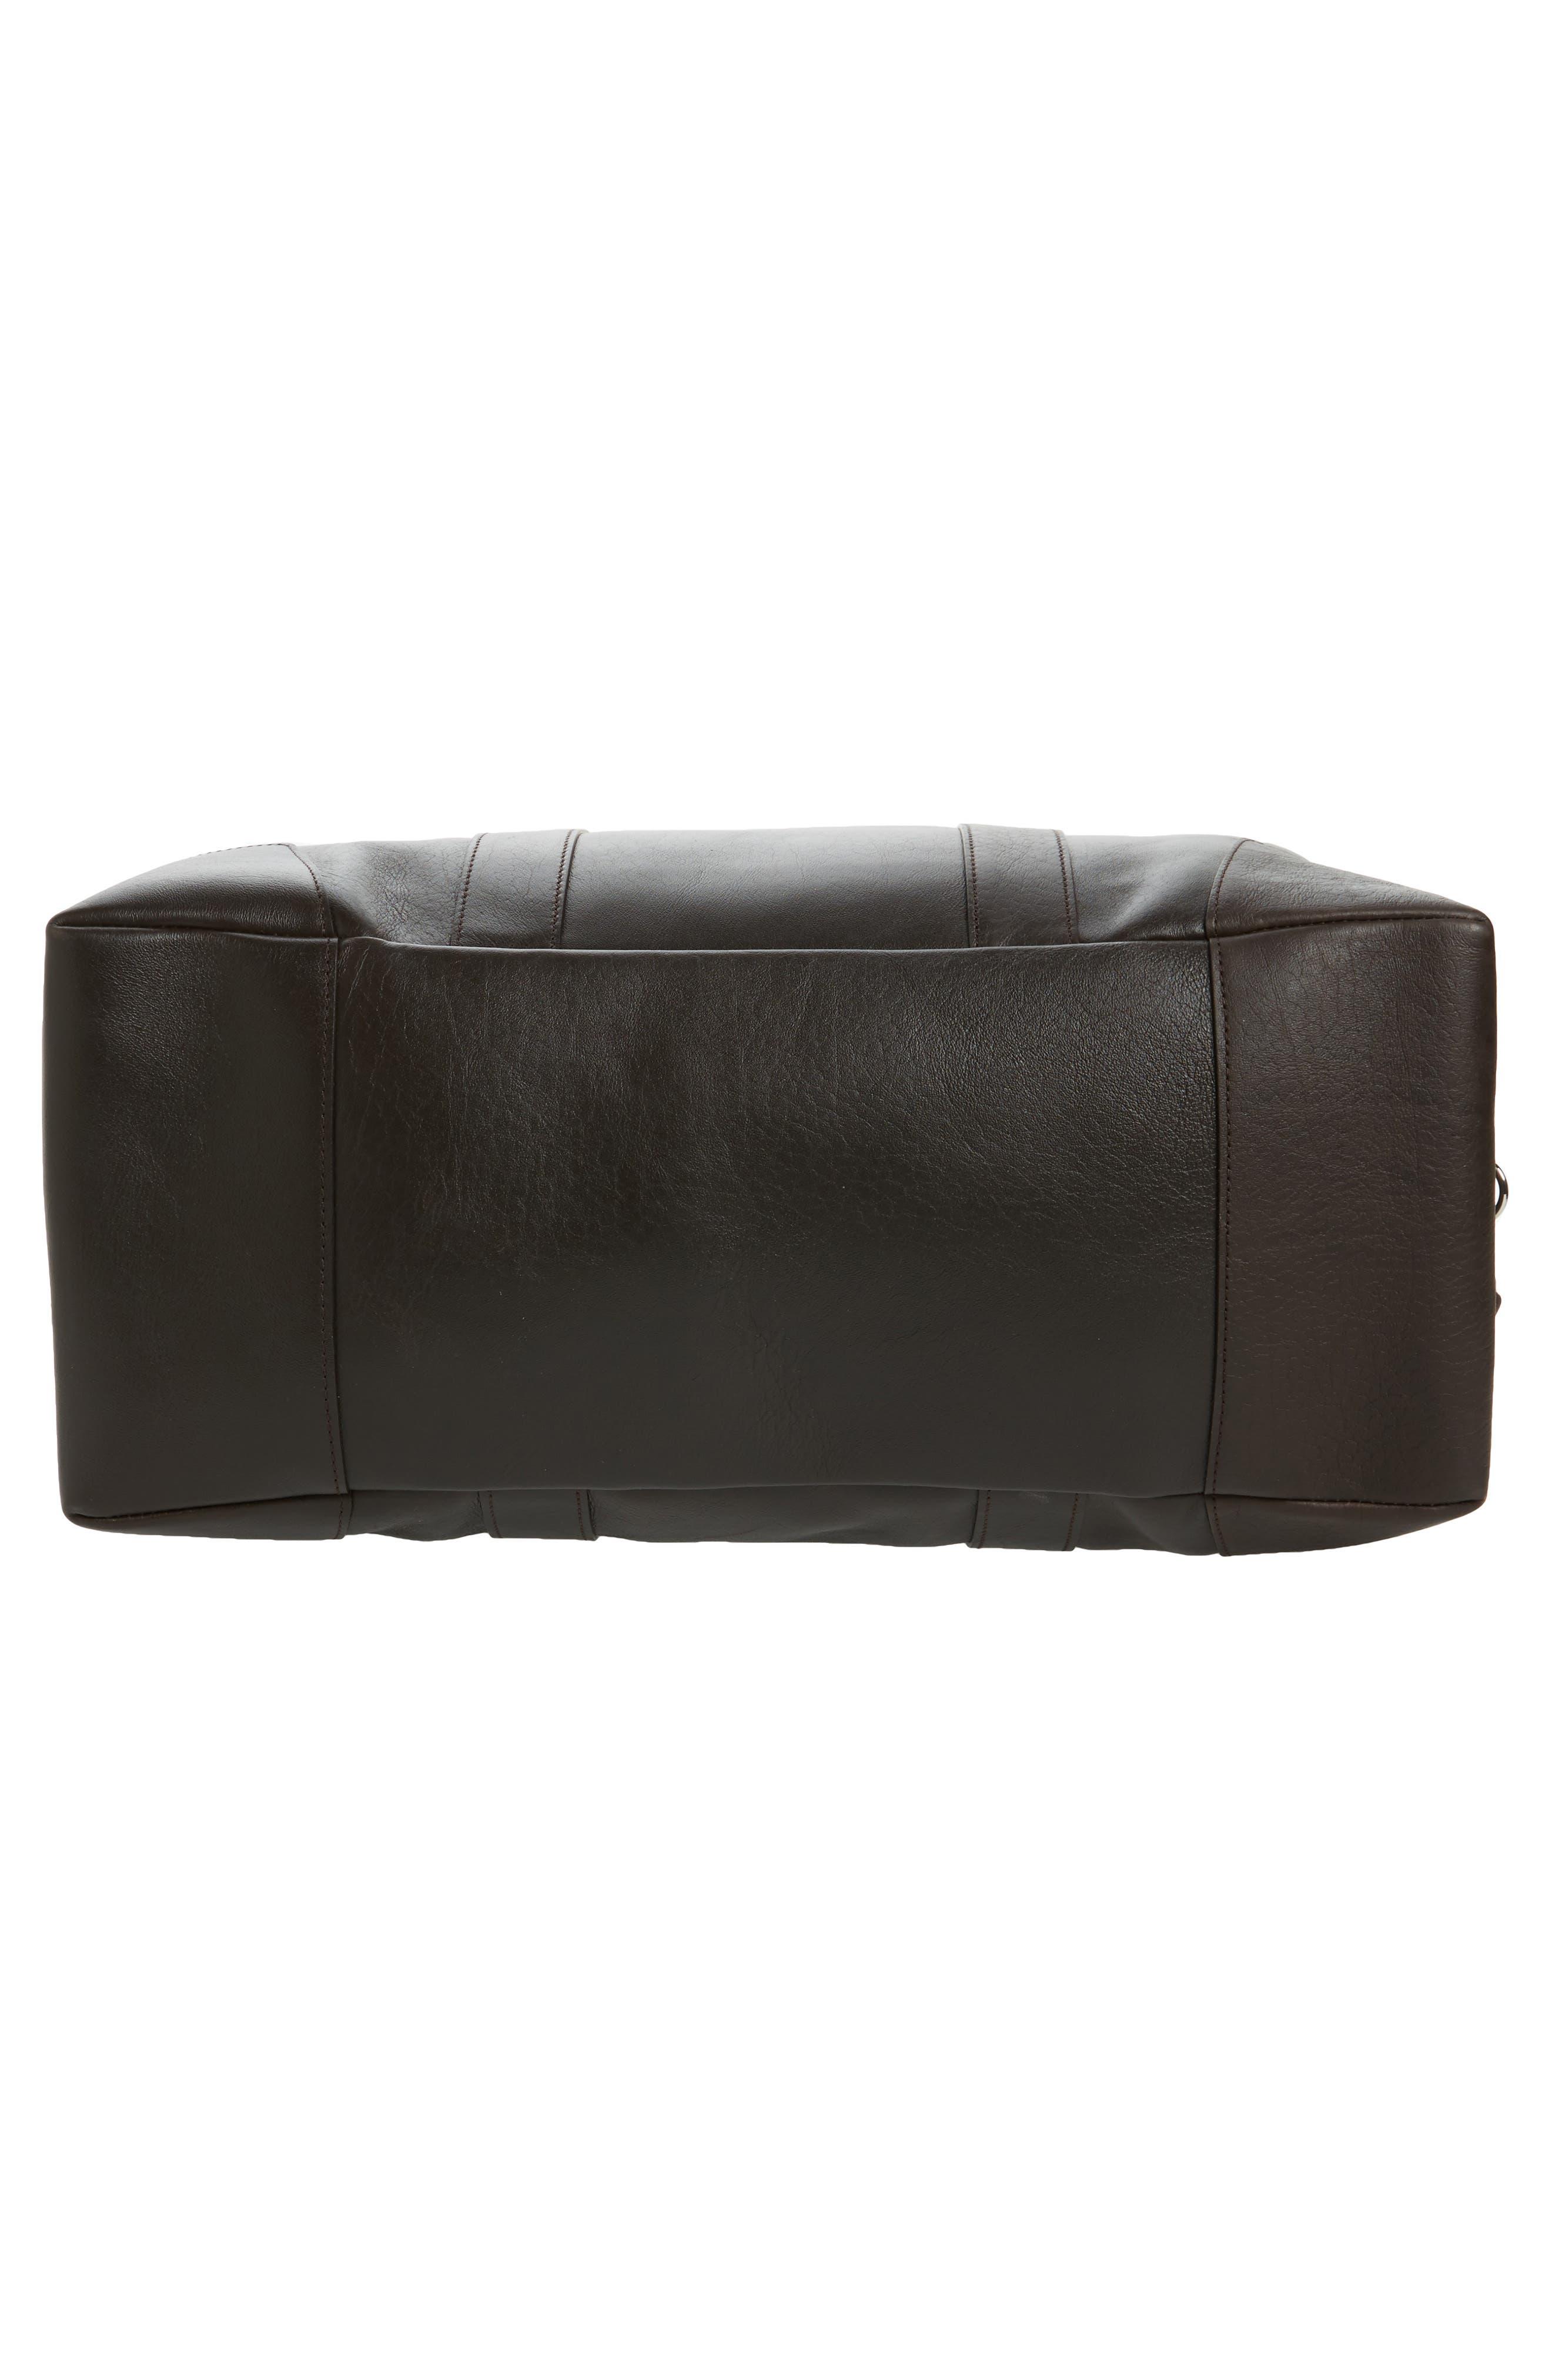 Signature Leather Duffel Bag,                             Alternate thumbnail 6, color,                             DEEP BROWN